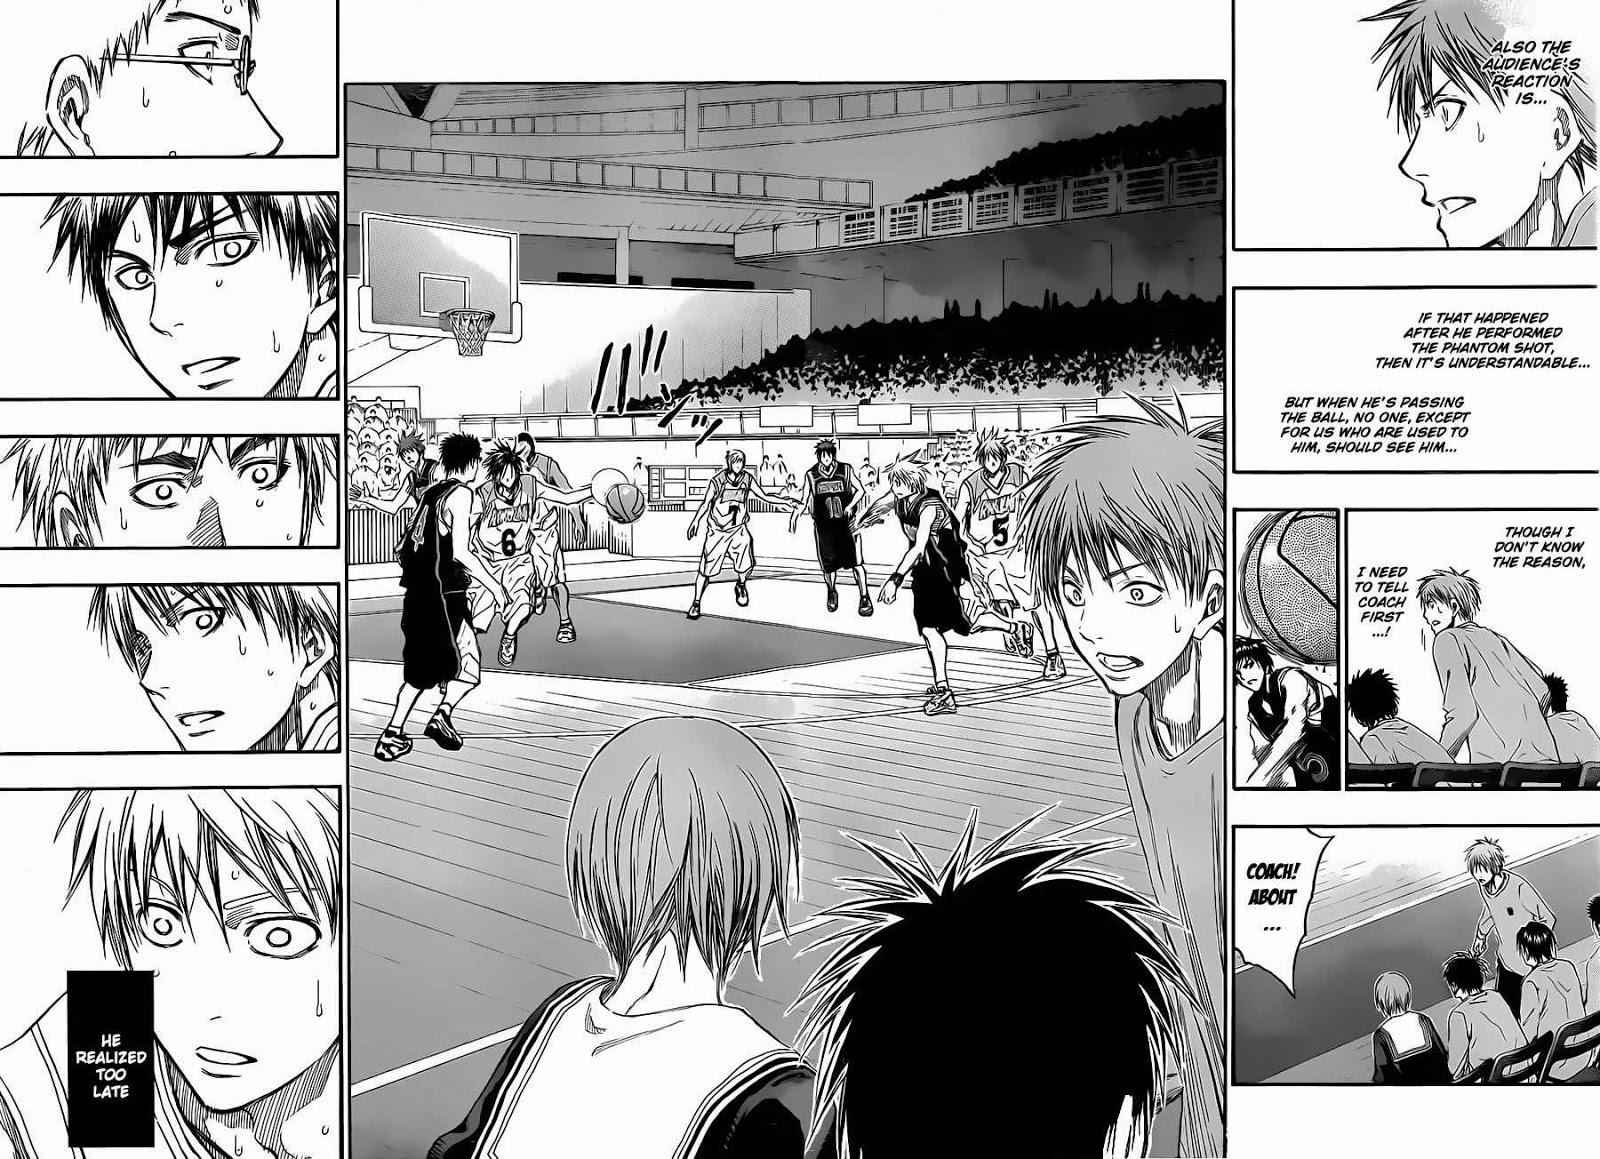 Kuroko no Basket Manga Chapter 236 - Image 13-14